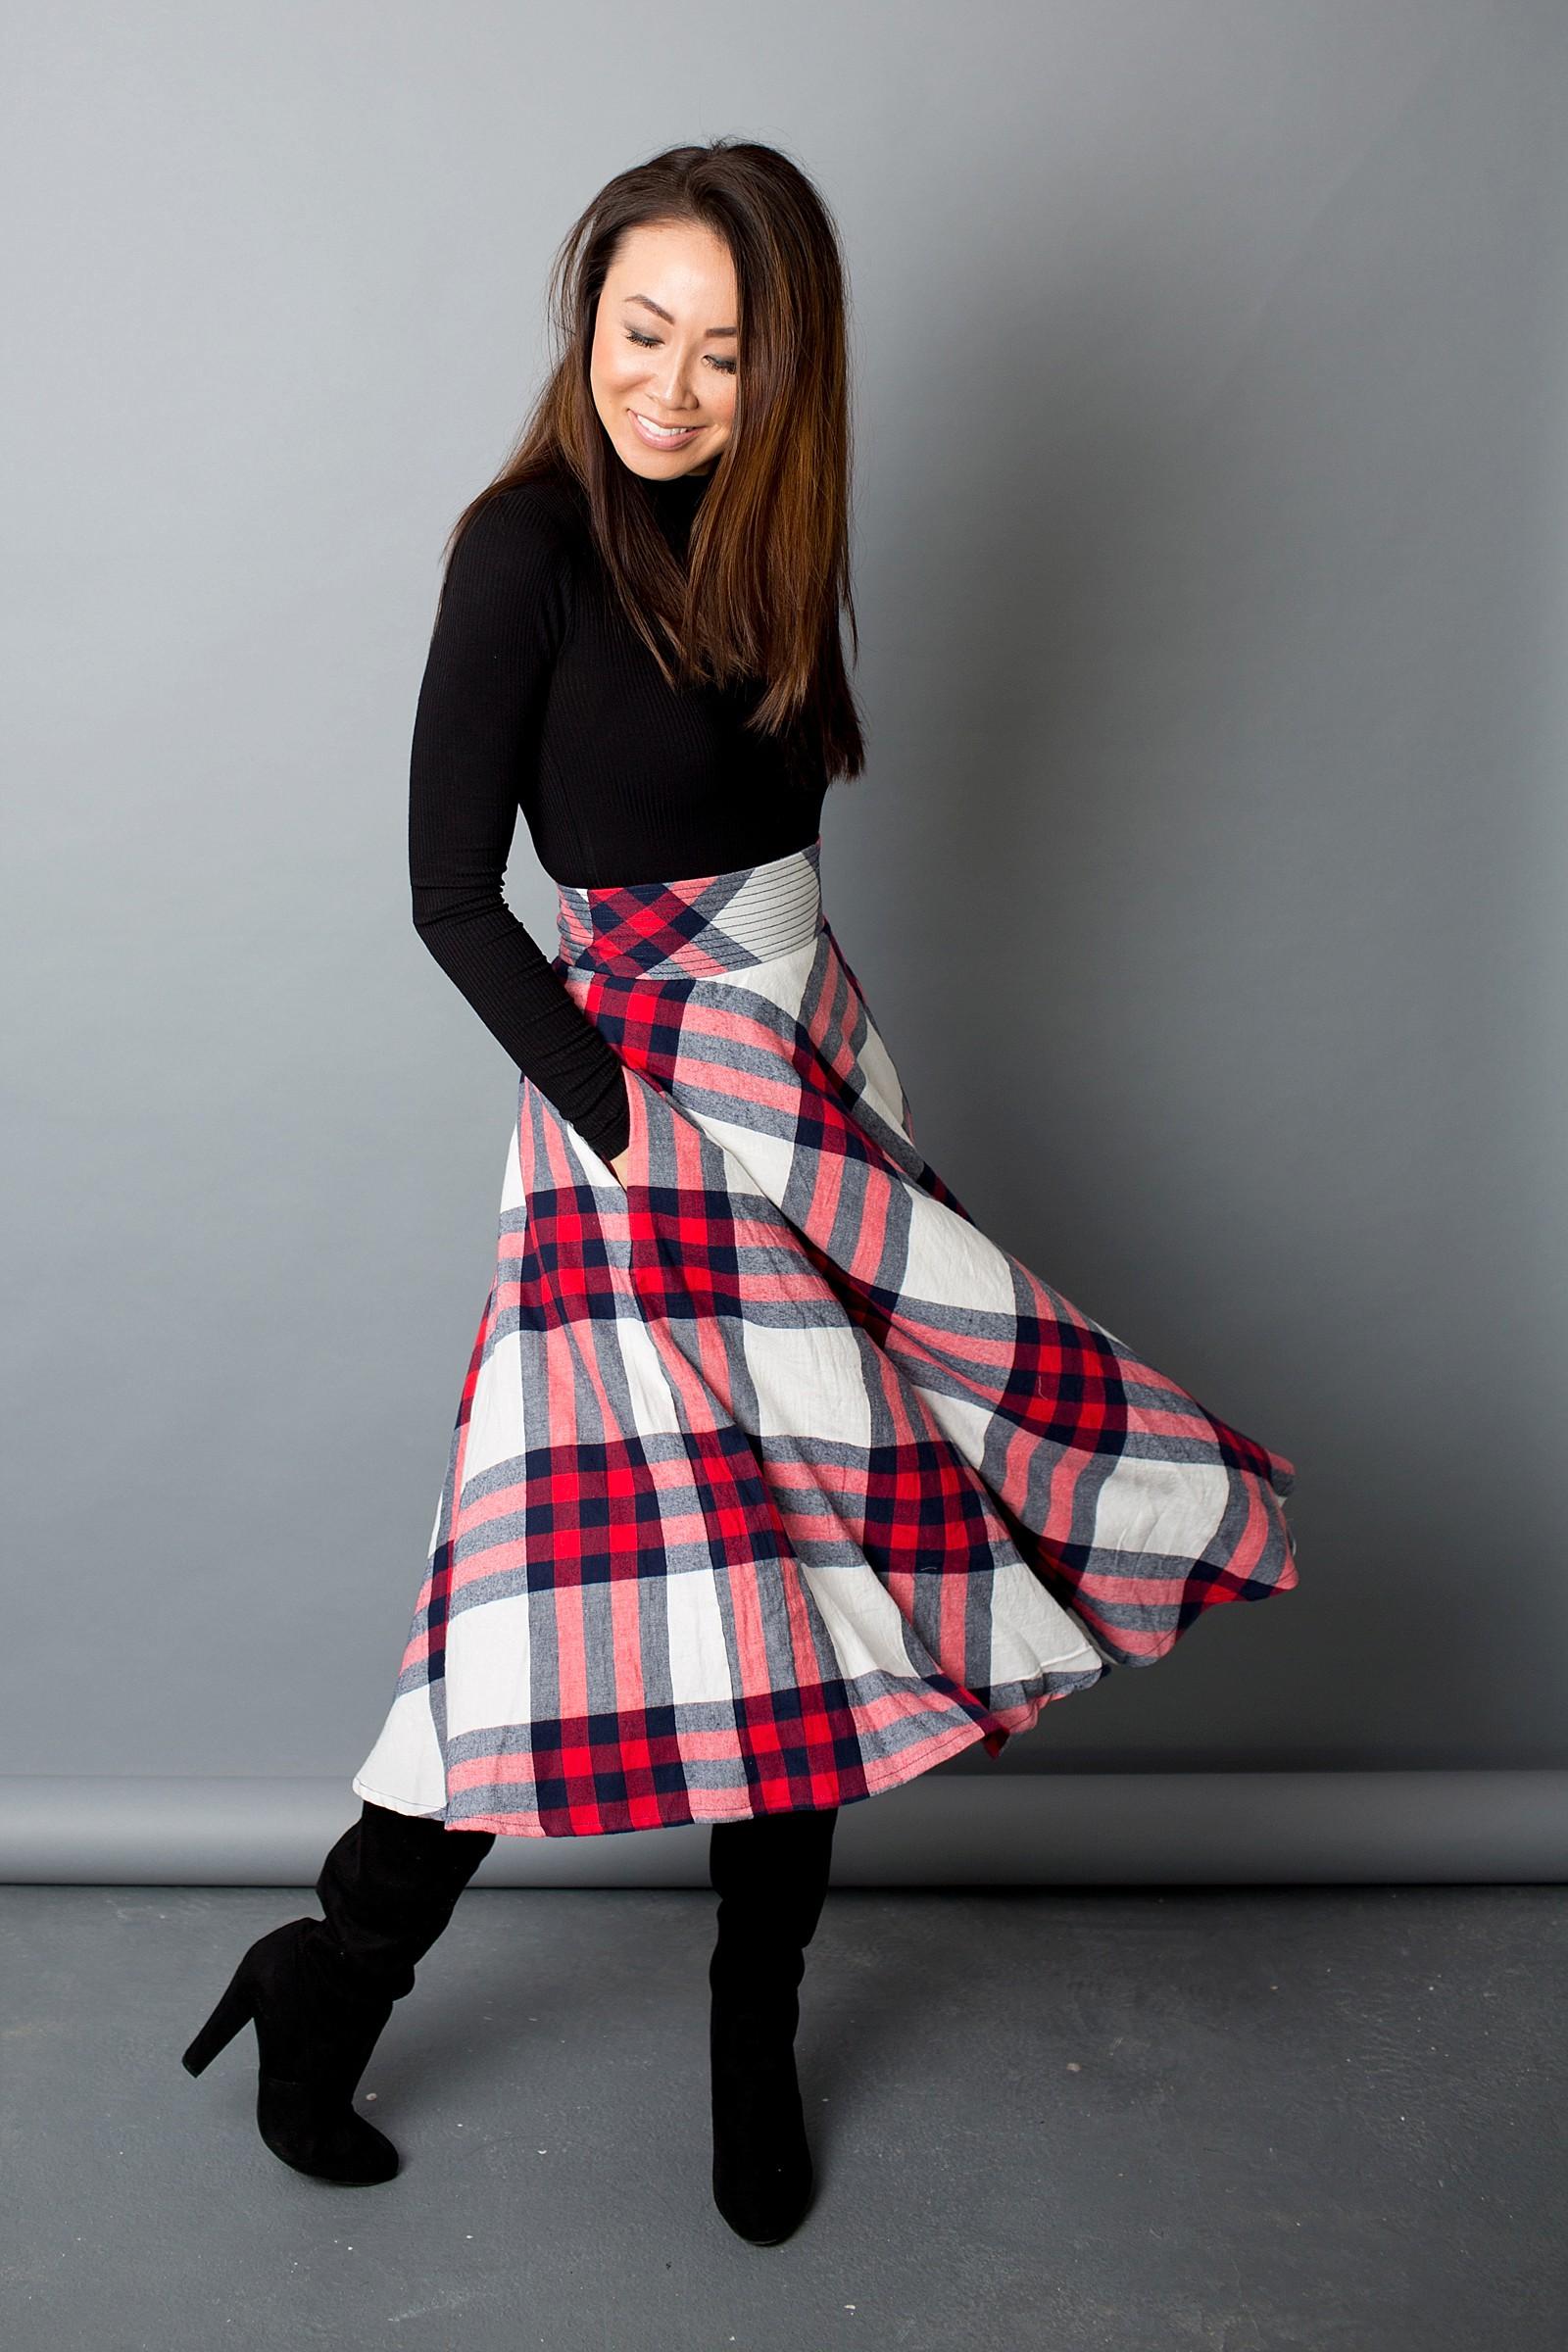 eshakti-com-custom-dresses-shirts-jeans-sponsored-diana-elizabeth-lifestyle-fashion-blogger-phoenix-arizona-1421